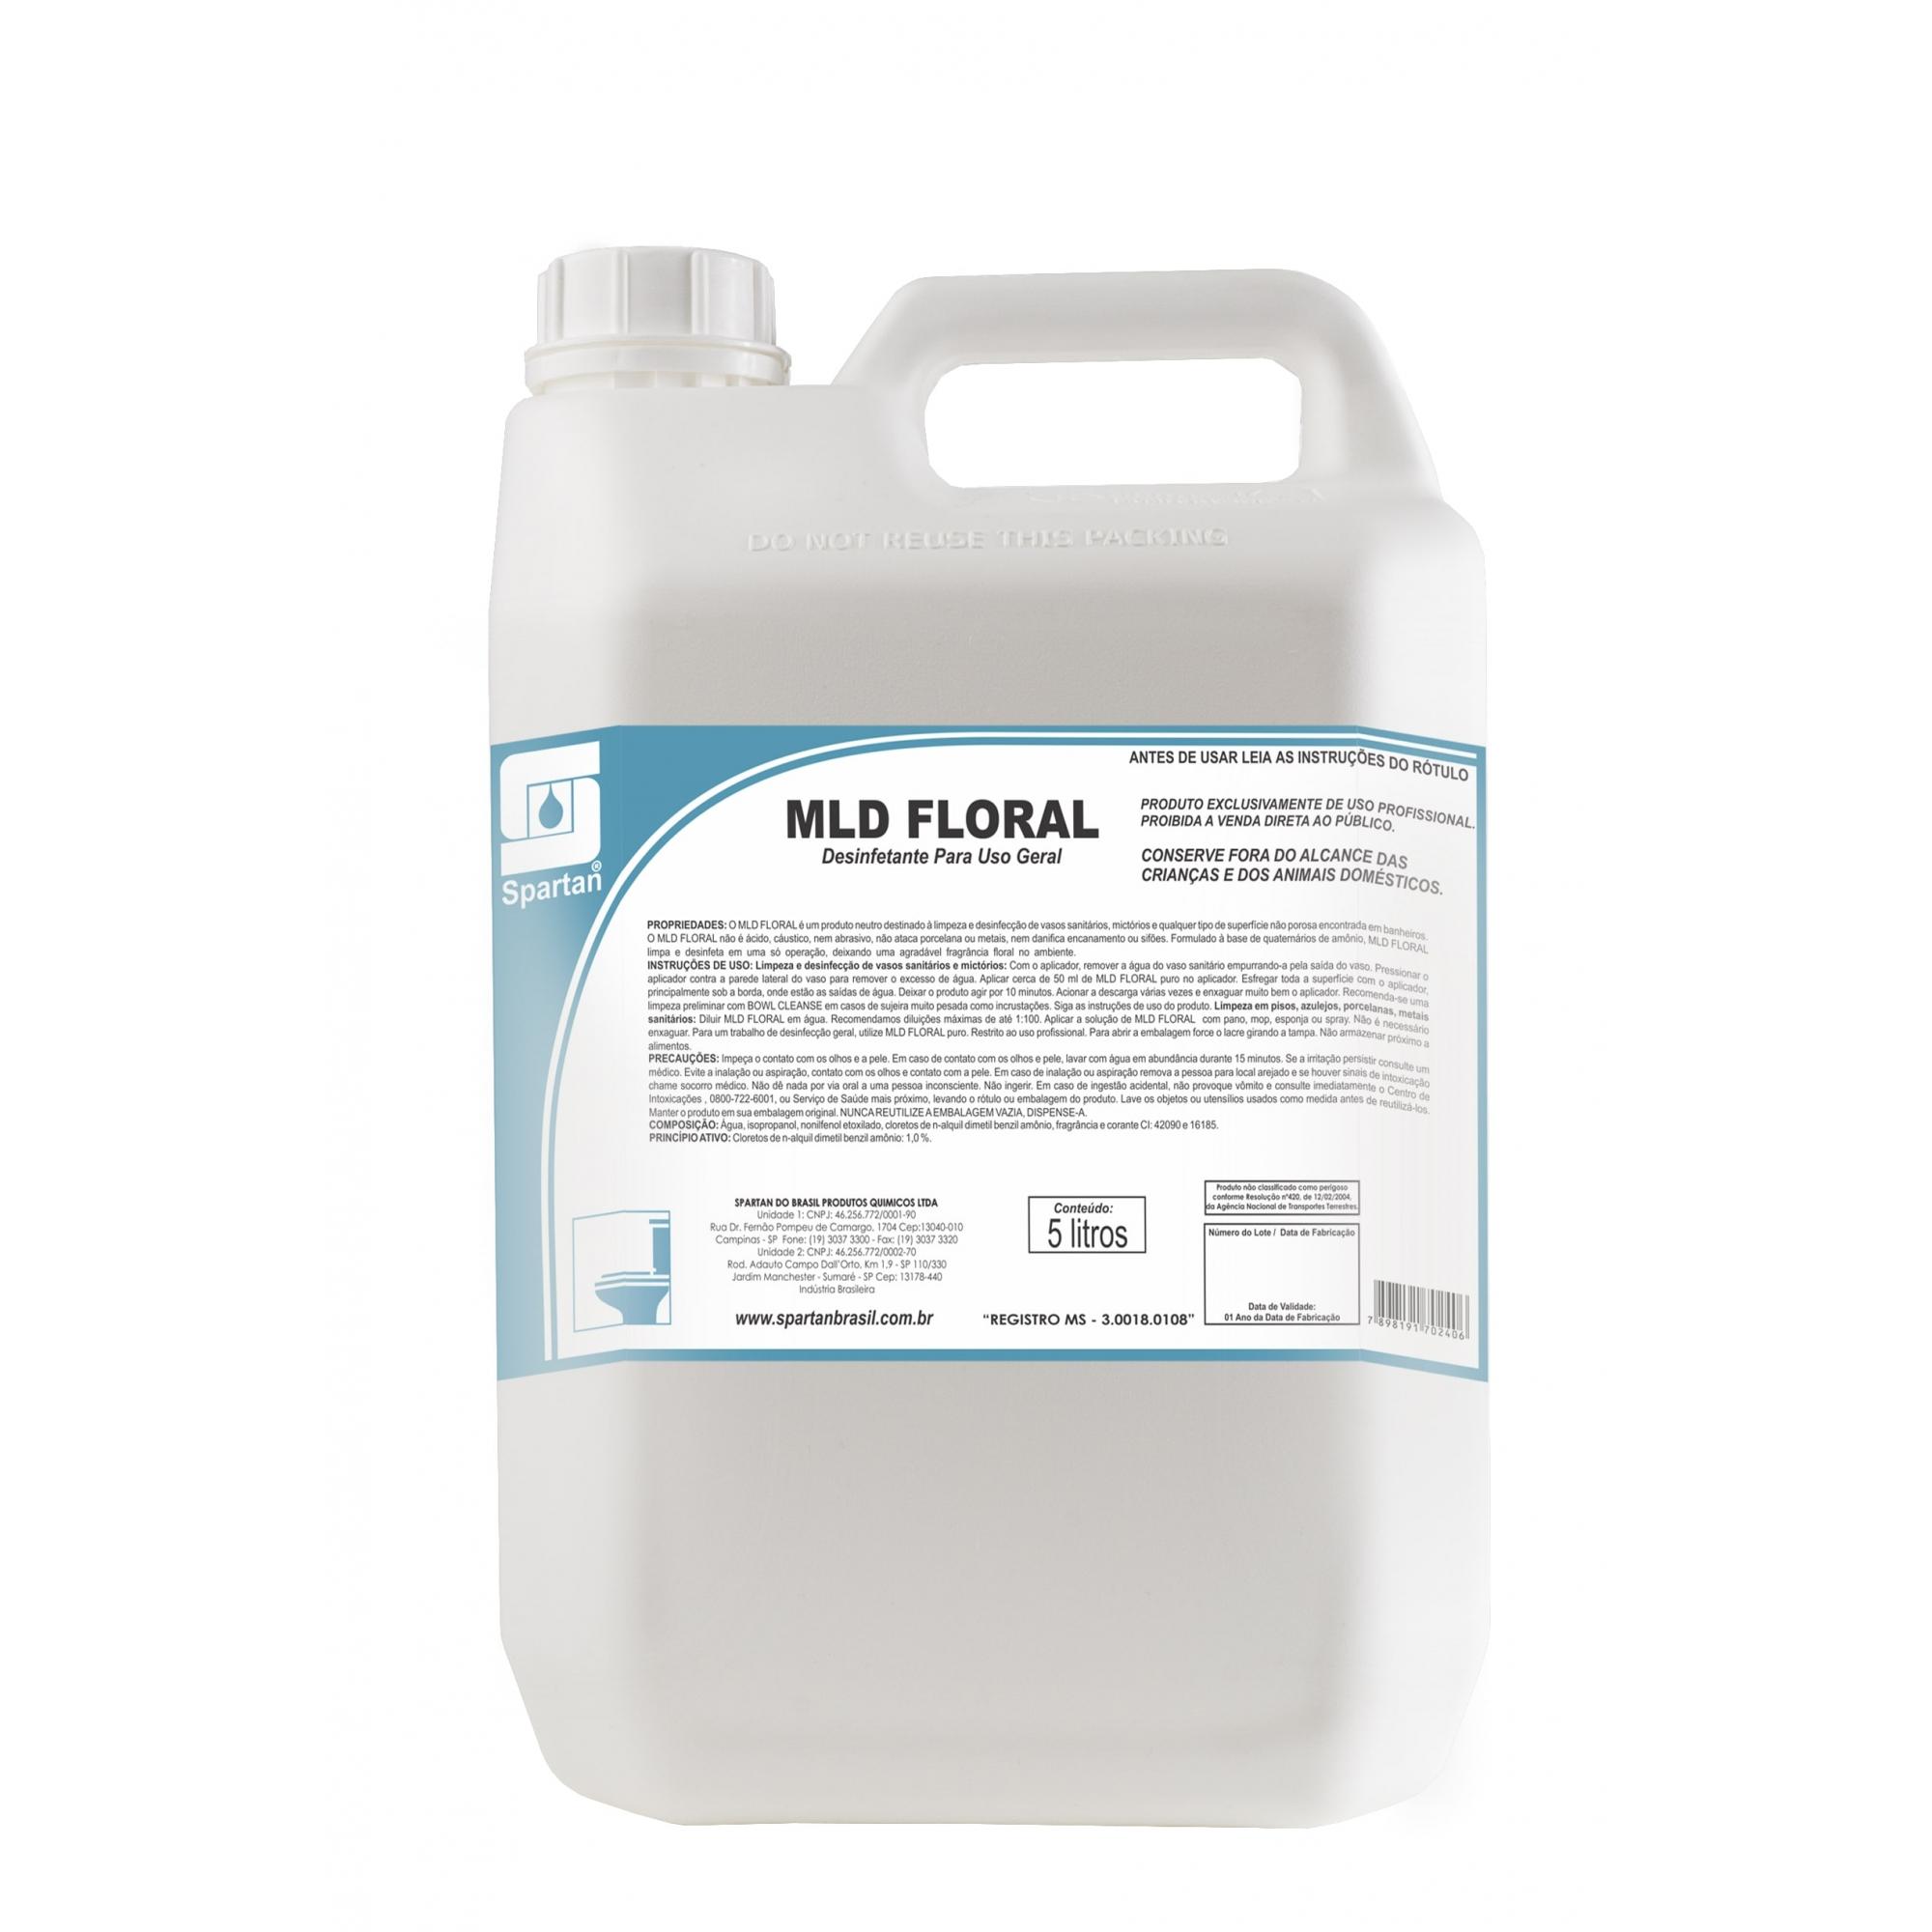 MLD Floral - Limpador + Desinfetante 5 Litros  - Higinet